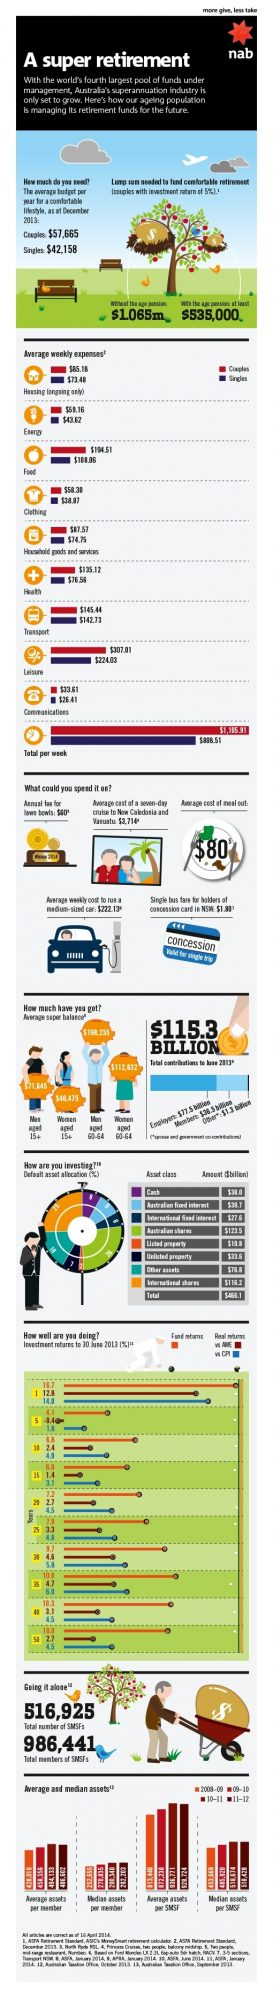 Superannuation-infographic-510px_v2